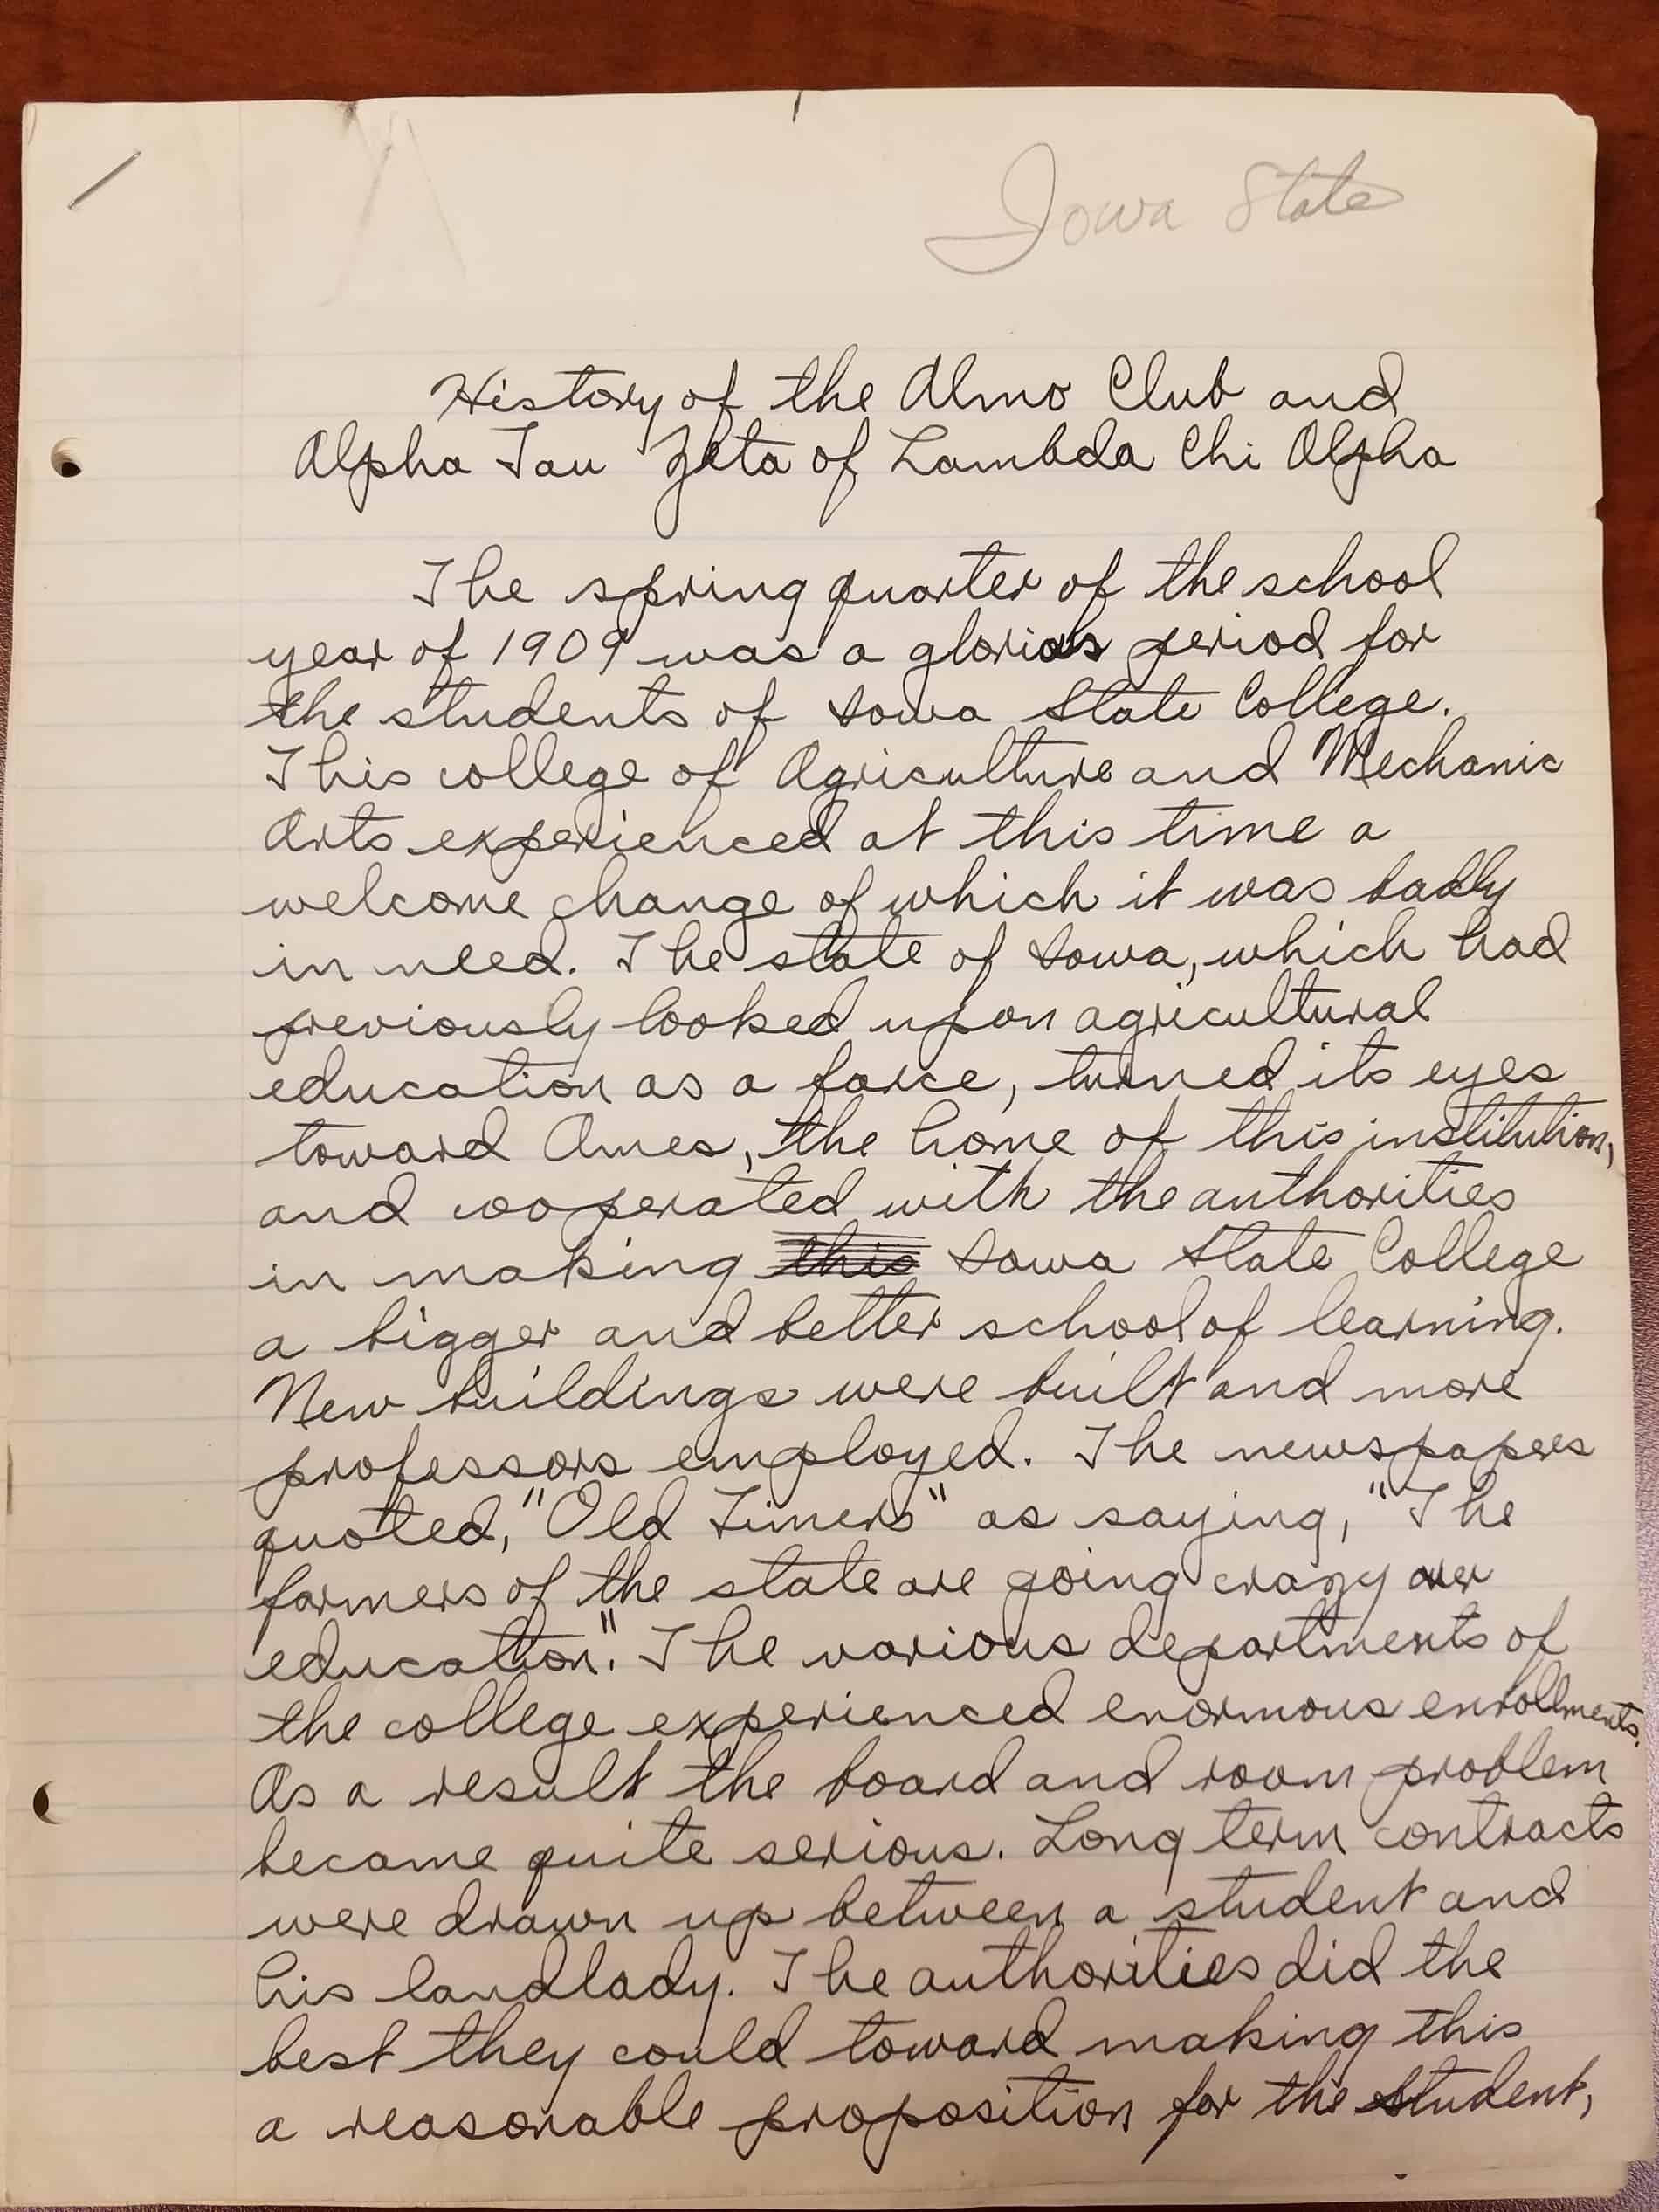 1909 History of Alamo Club